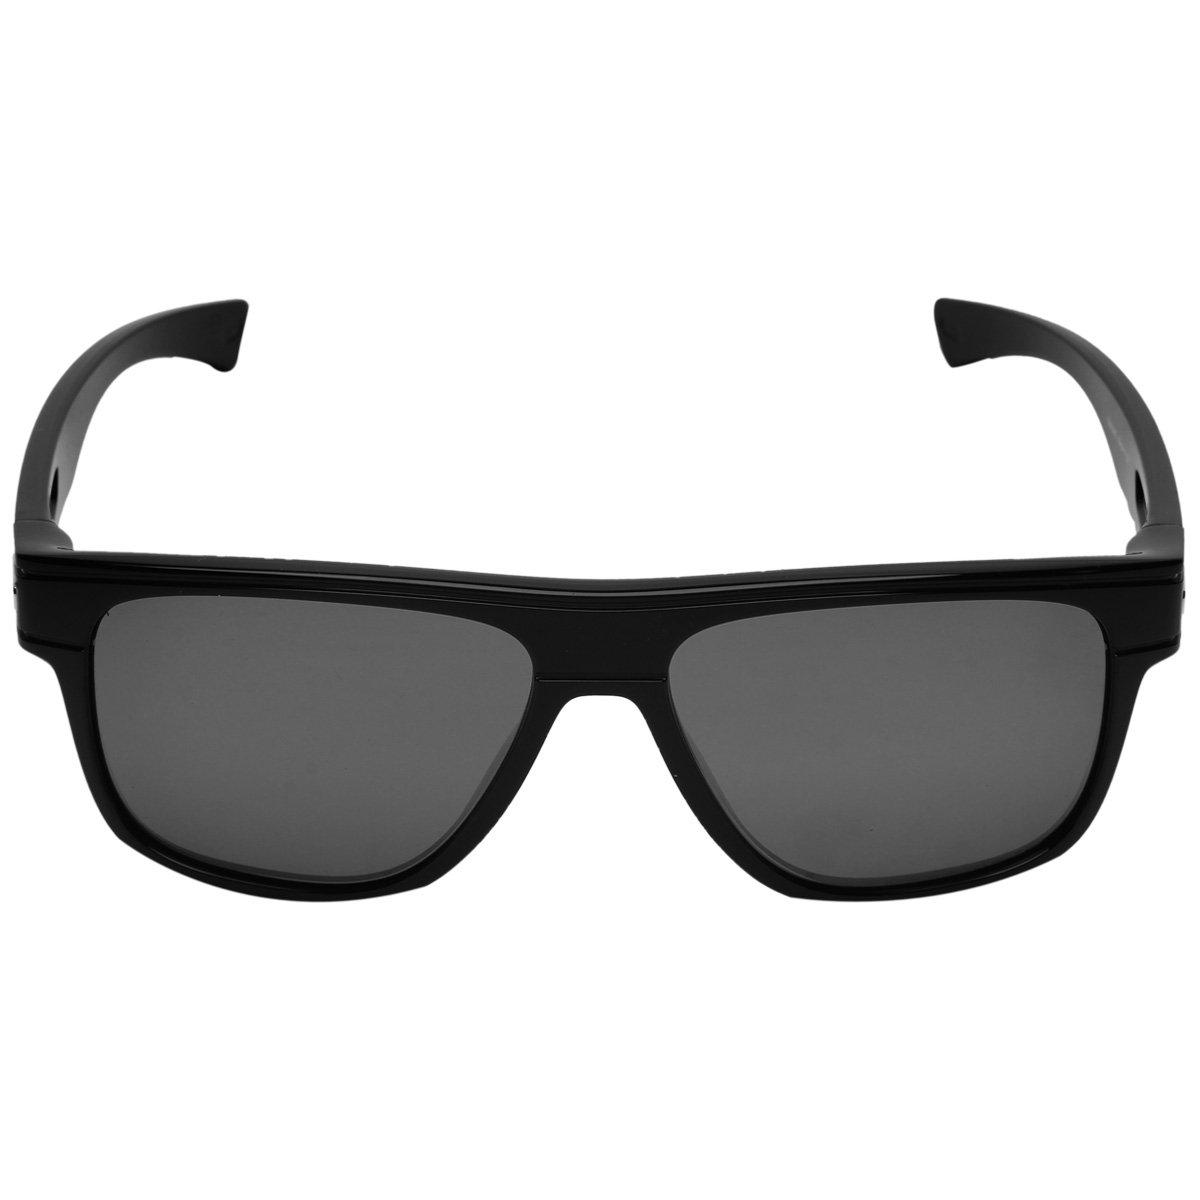 6b8d70c8b2504 Óculos de Sol Oakley Breadbox Iridium - Compre Agora   Netshoes